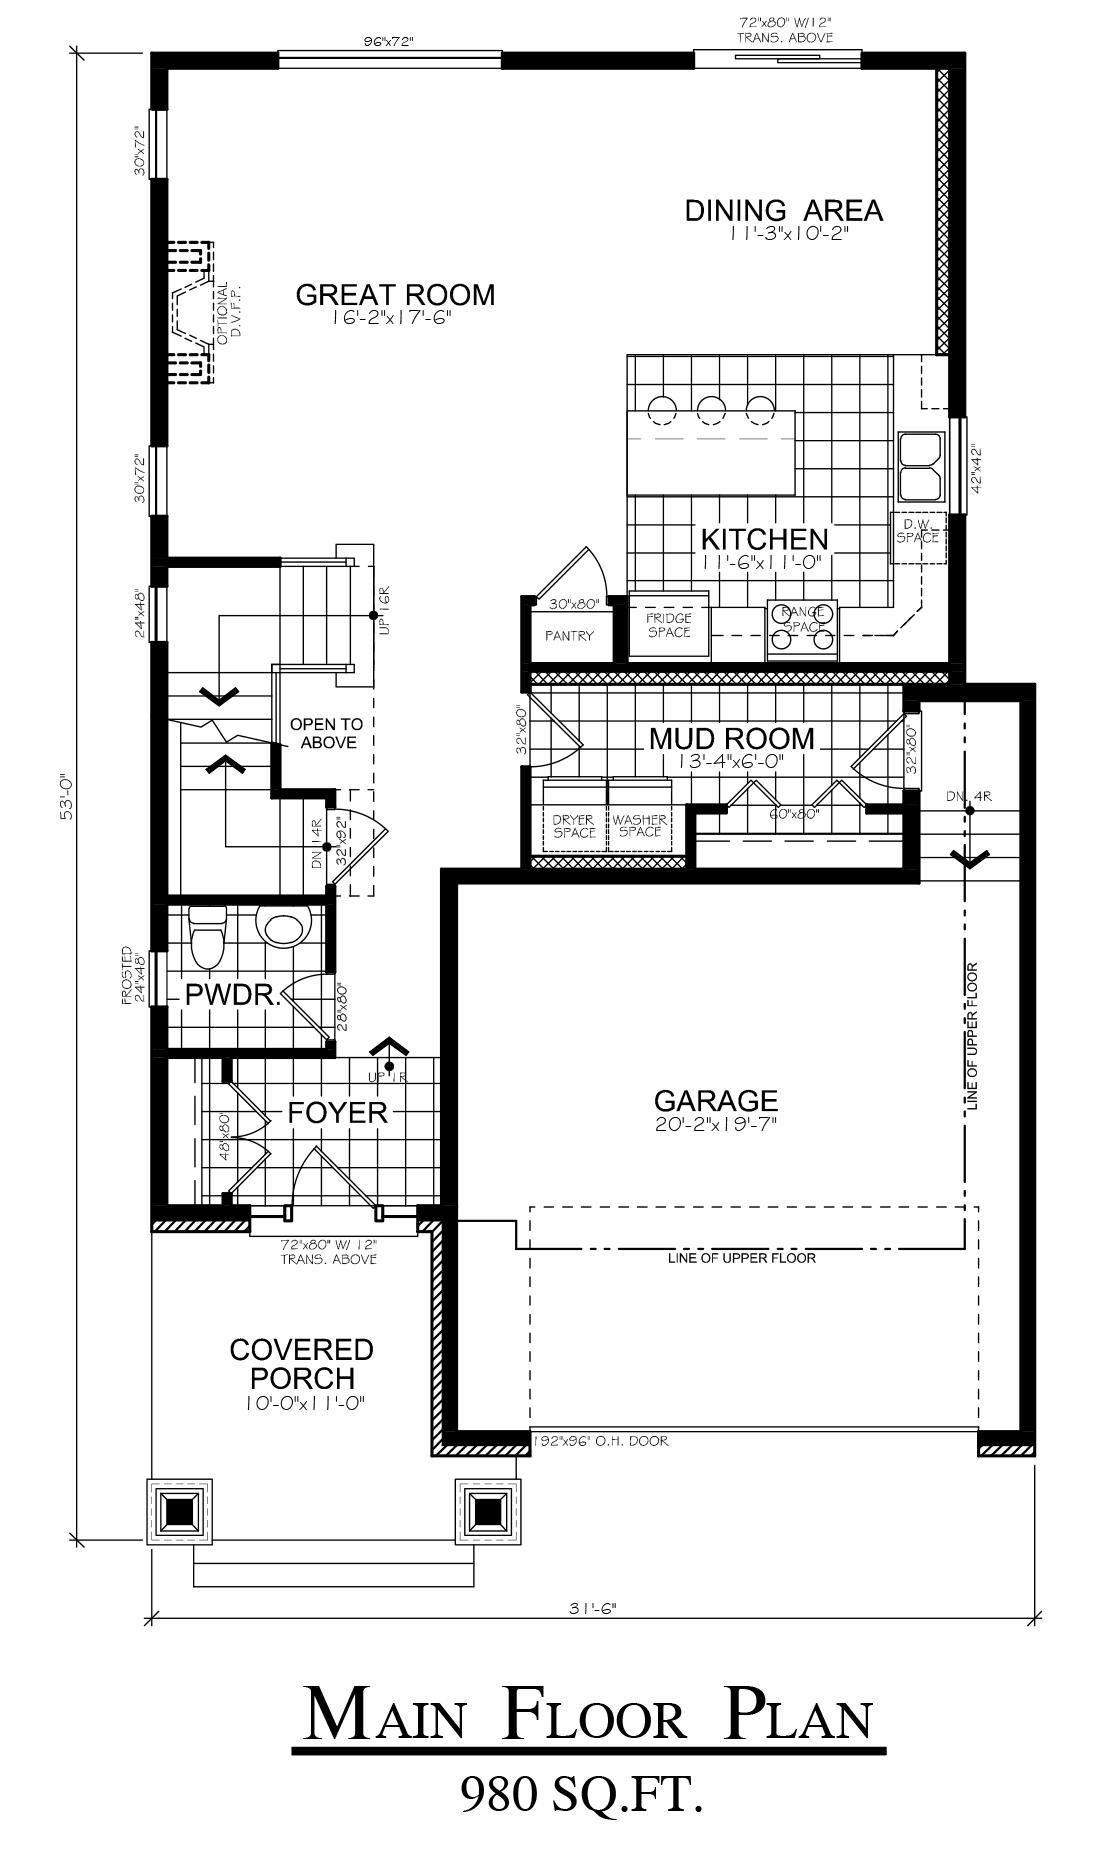 hudson-floor-main